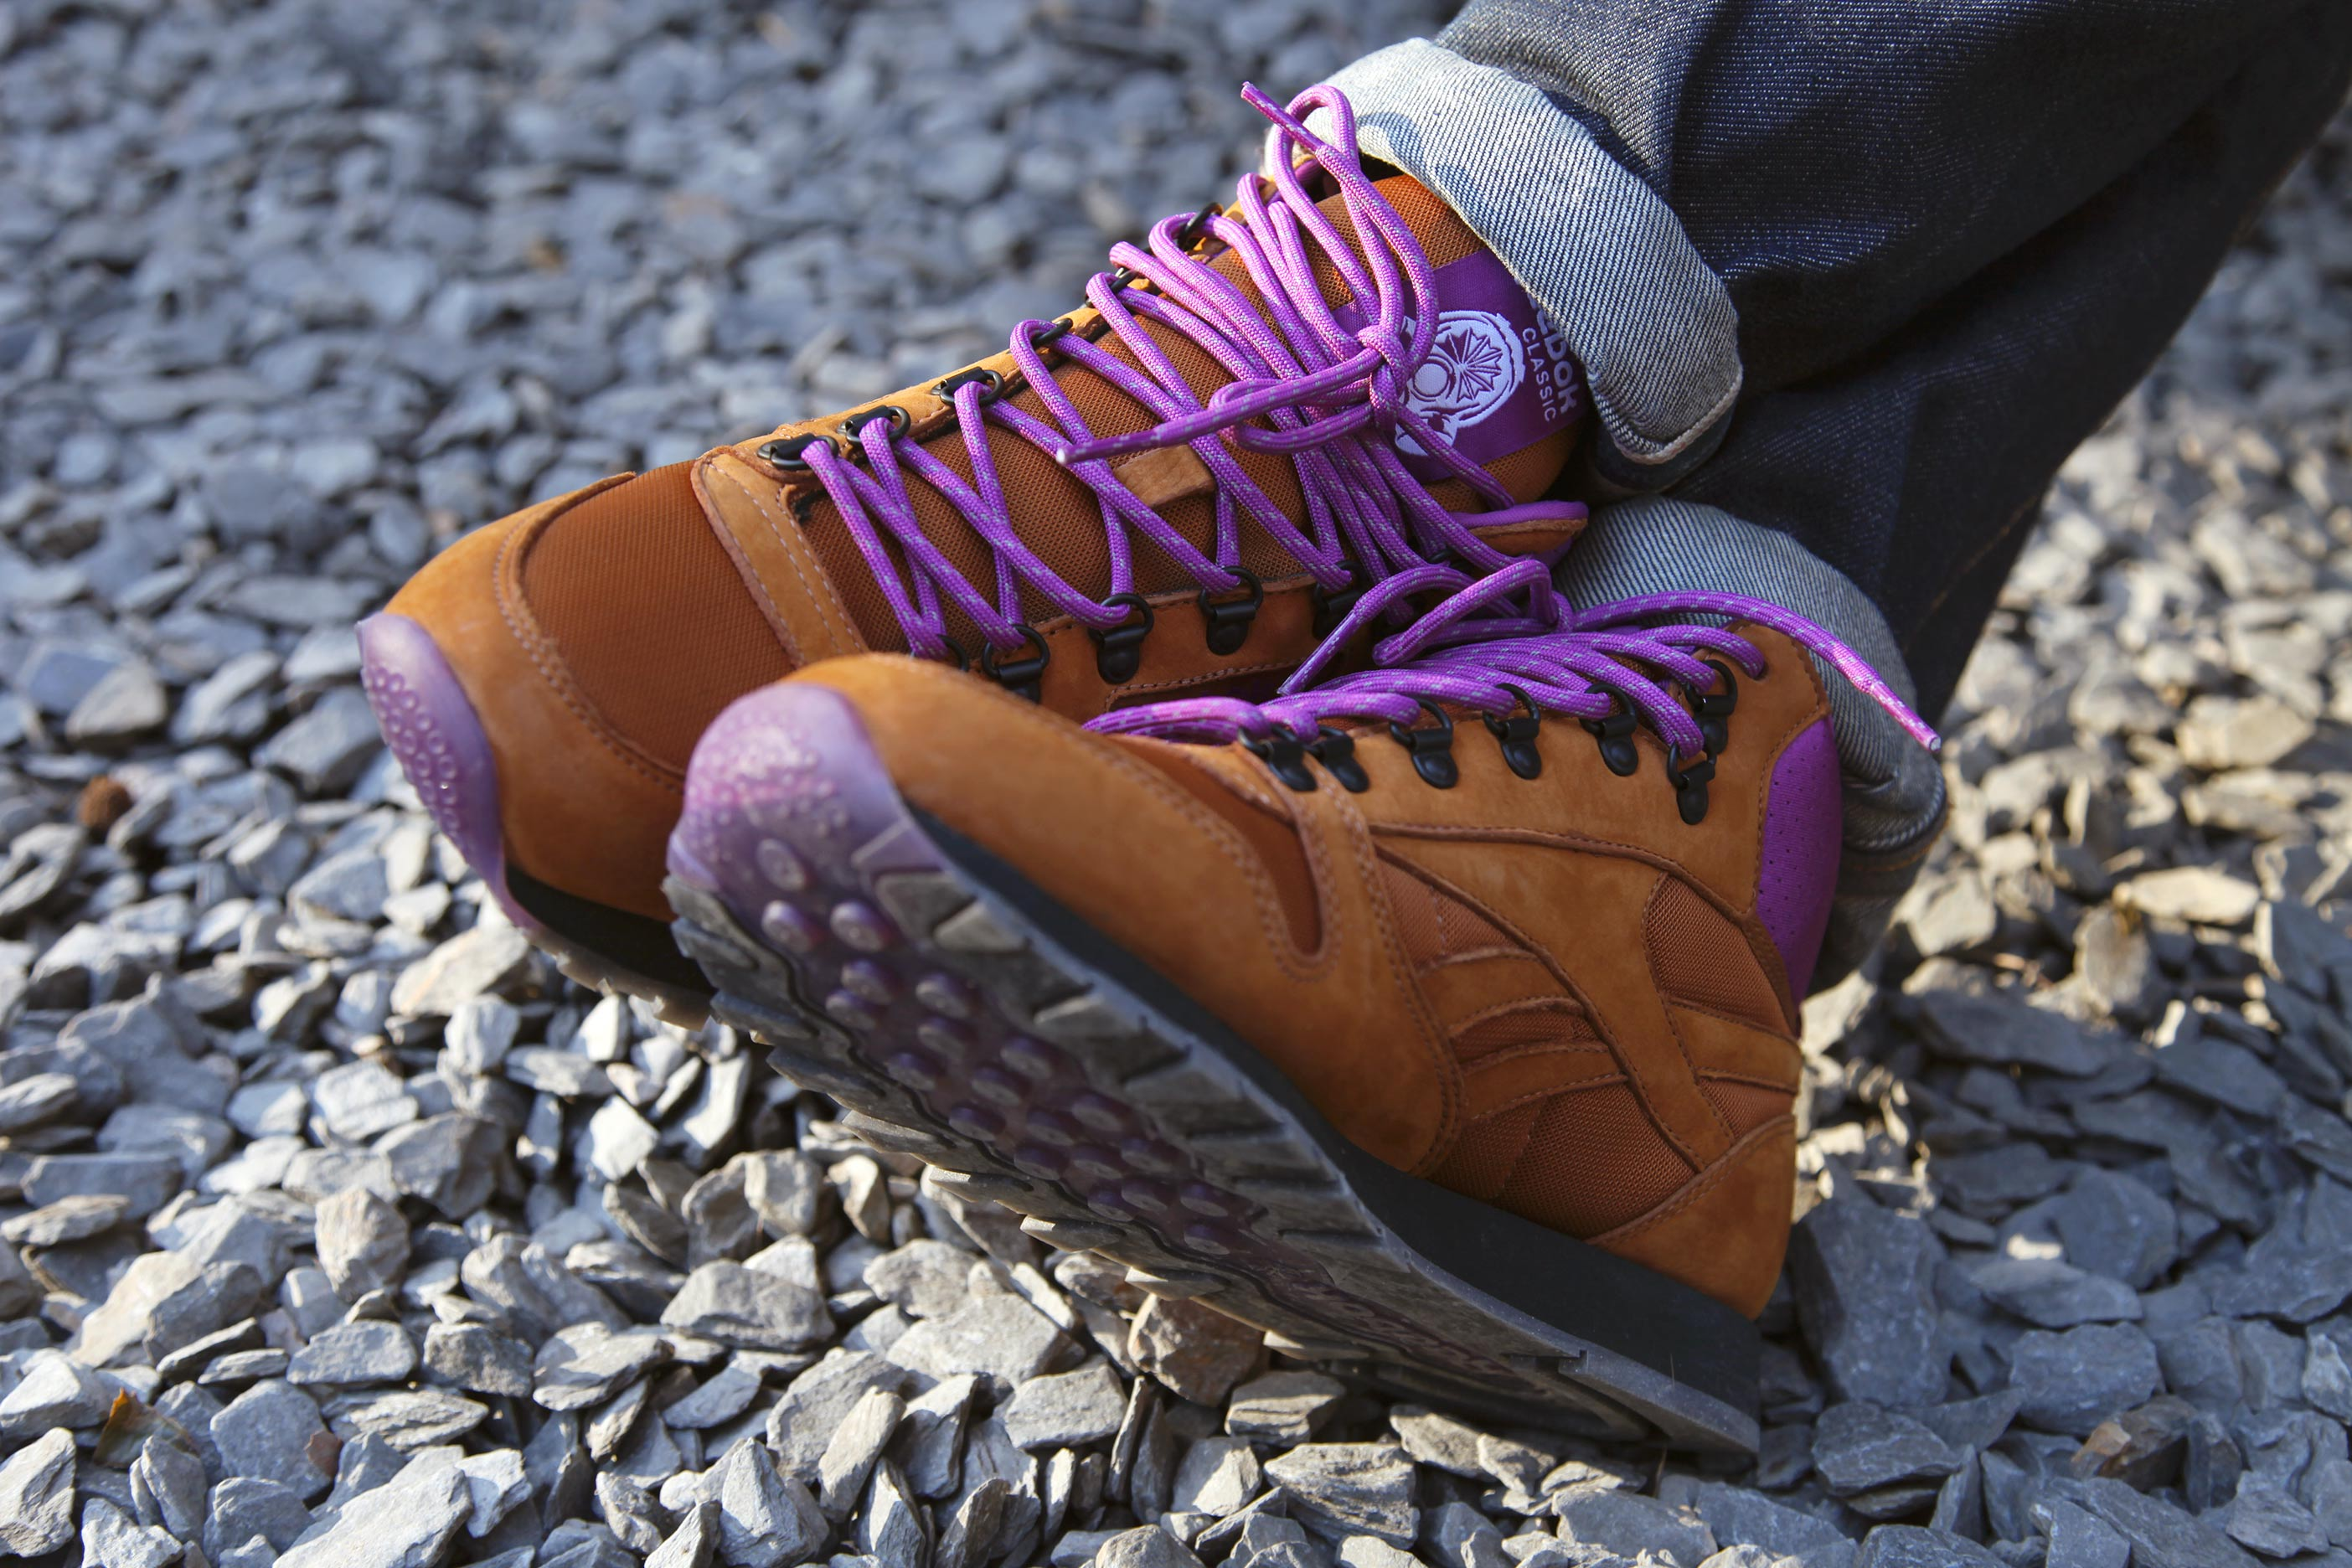 Foot Patrol x Reebok Classic Leather Mid 'On The Rocks